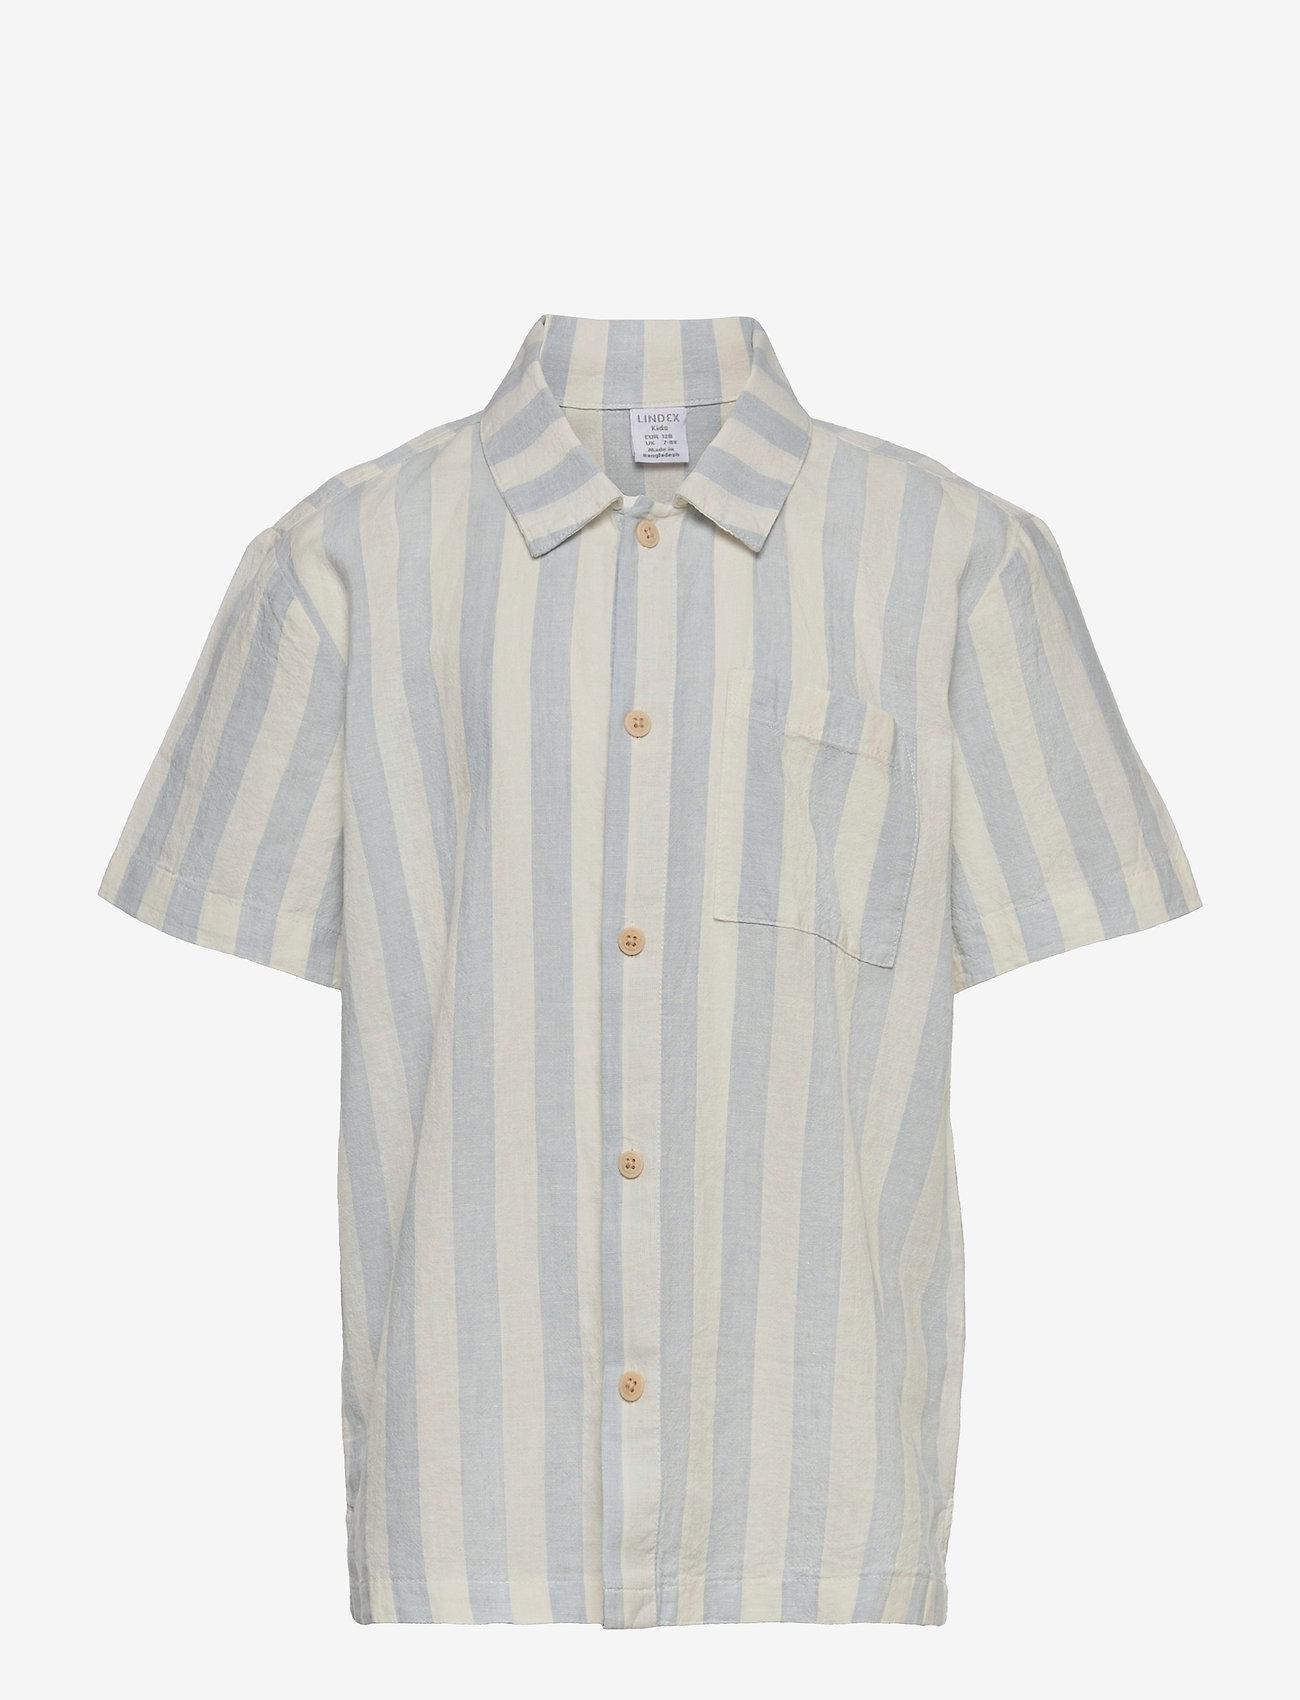 Lindex - Shirt shortsleeved  linen cott - shirts - white - 0